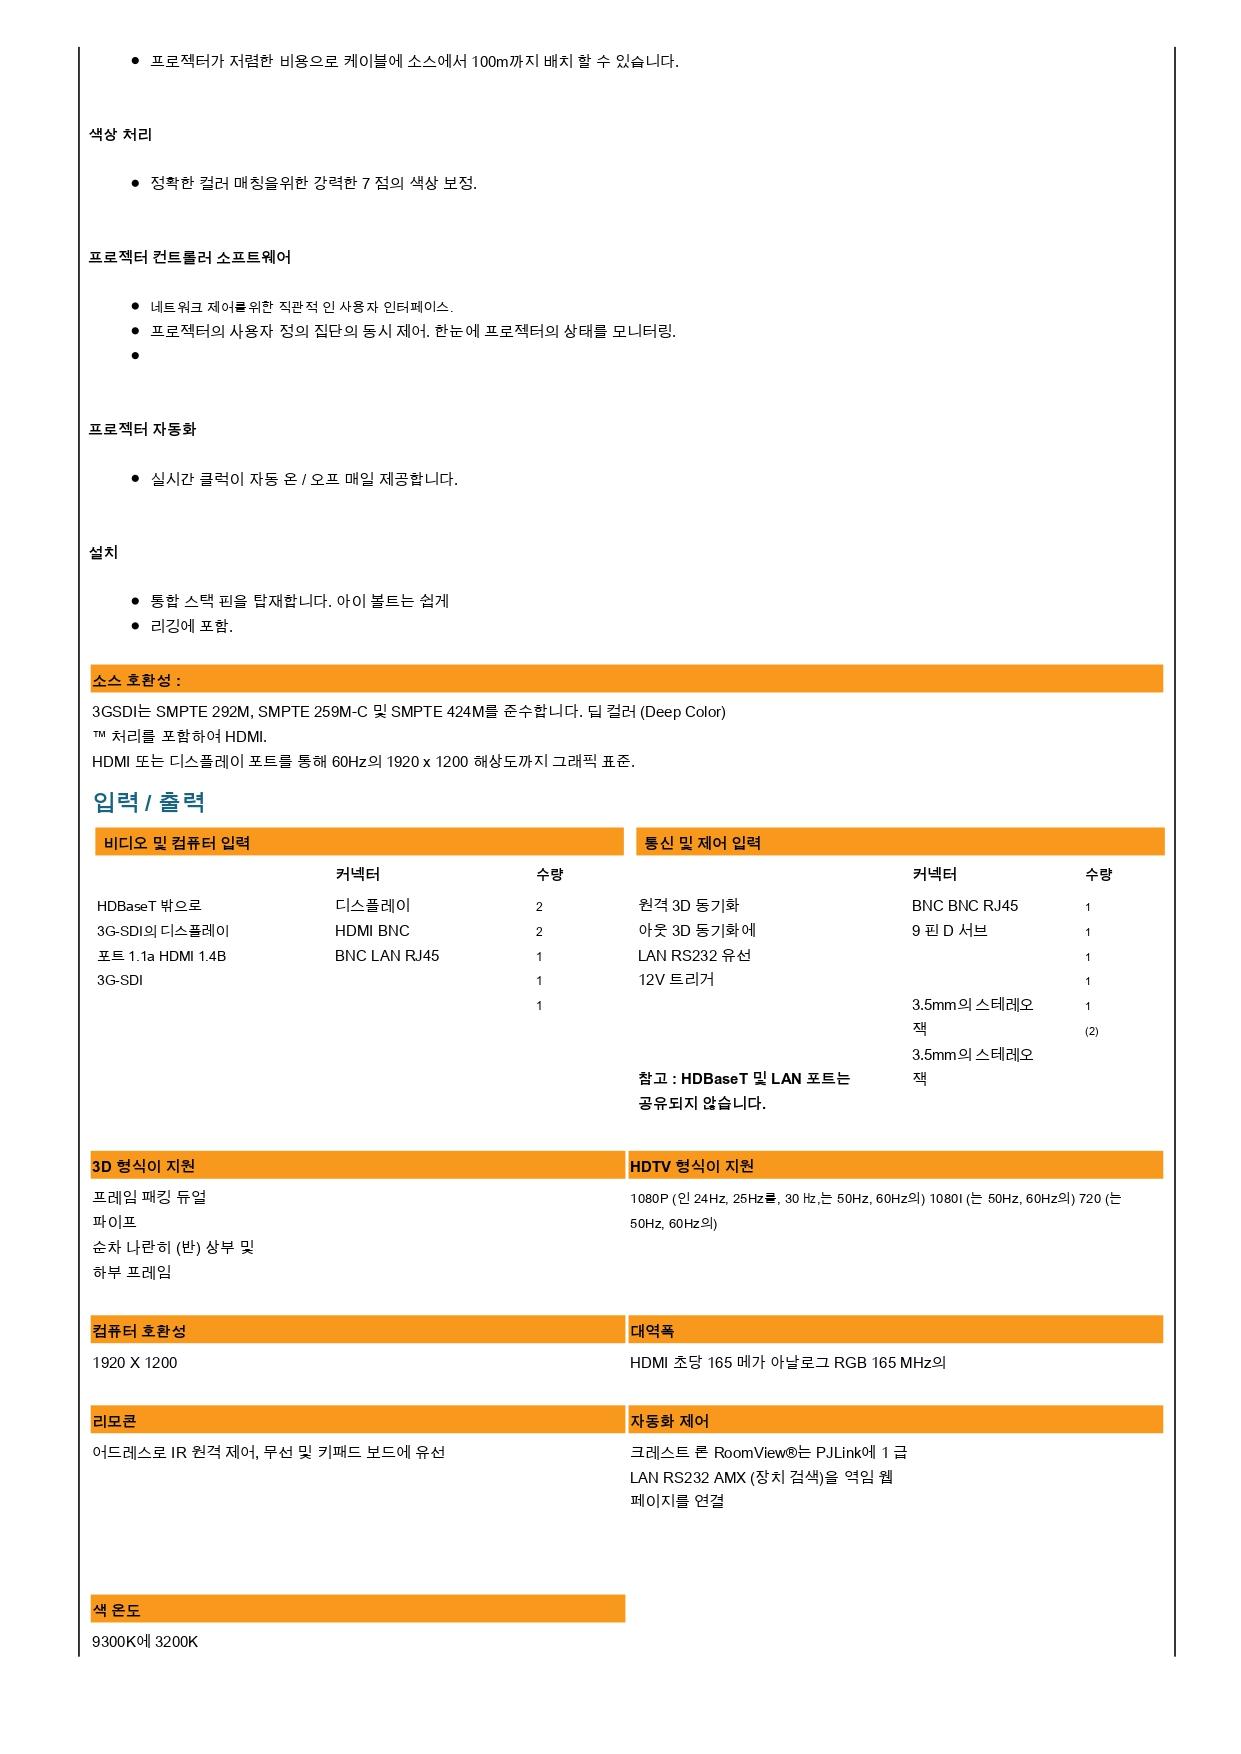 digitalprojection-119-673.en.ko_page-0002.jpg